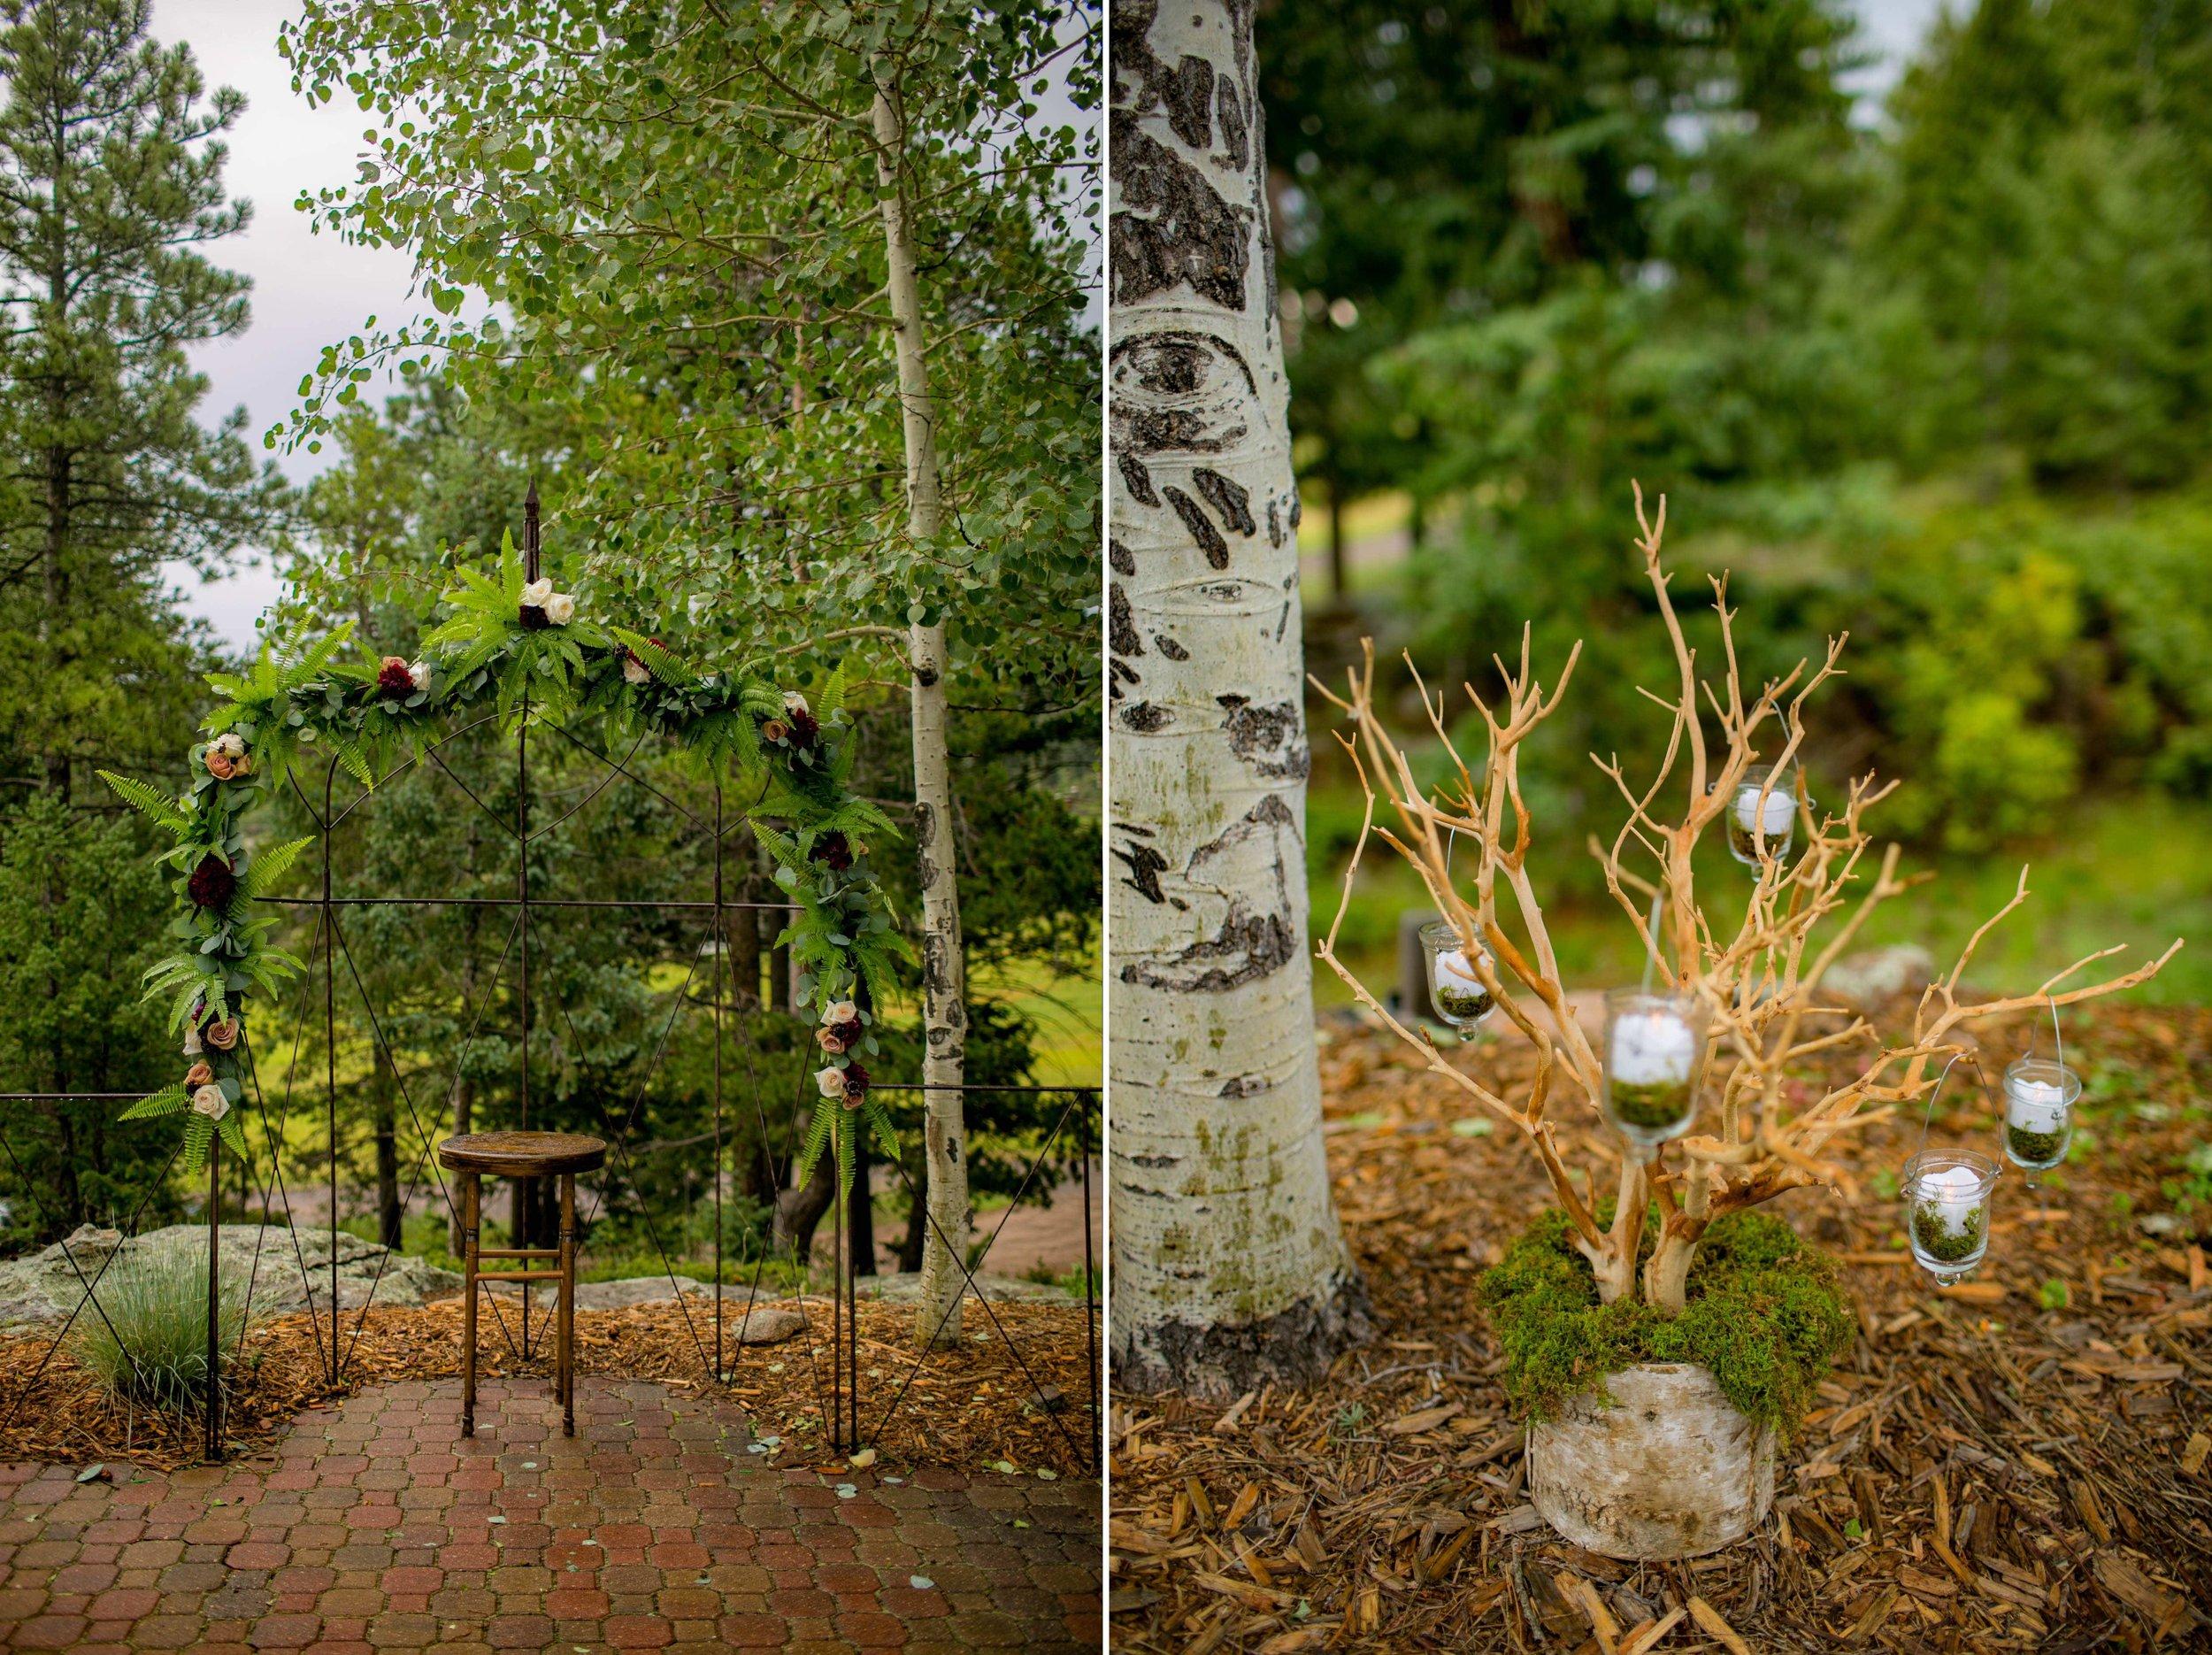 _meadowsatmarshdale_coloradoweddingphotographer_www.kisaconrad.com_123456789012345 20170812-607A6031 copy.jpeg